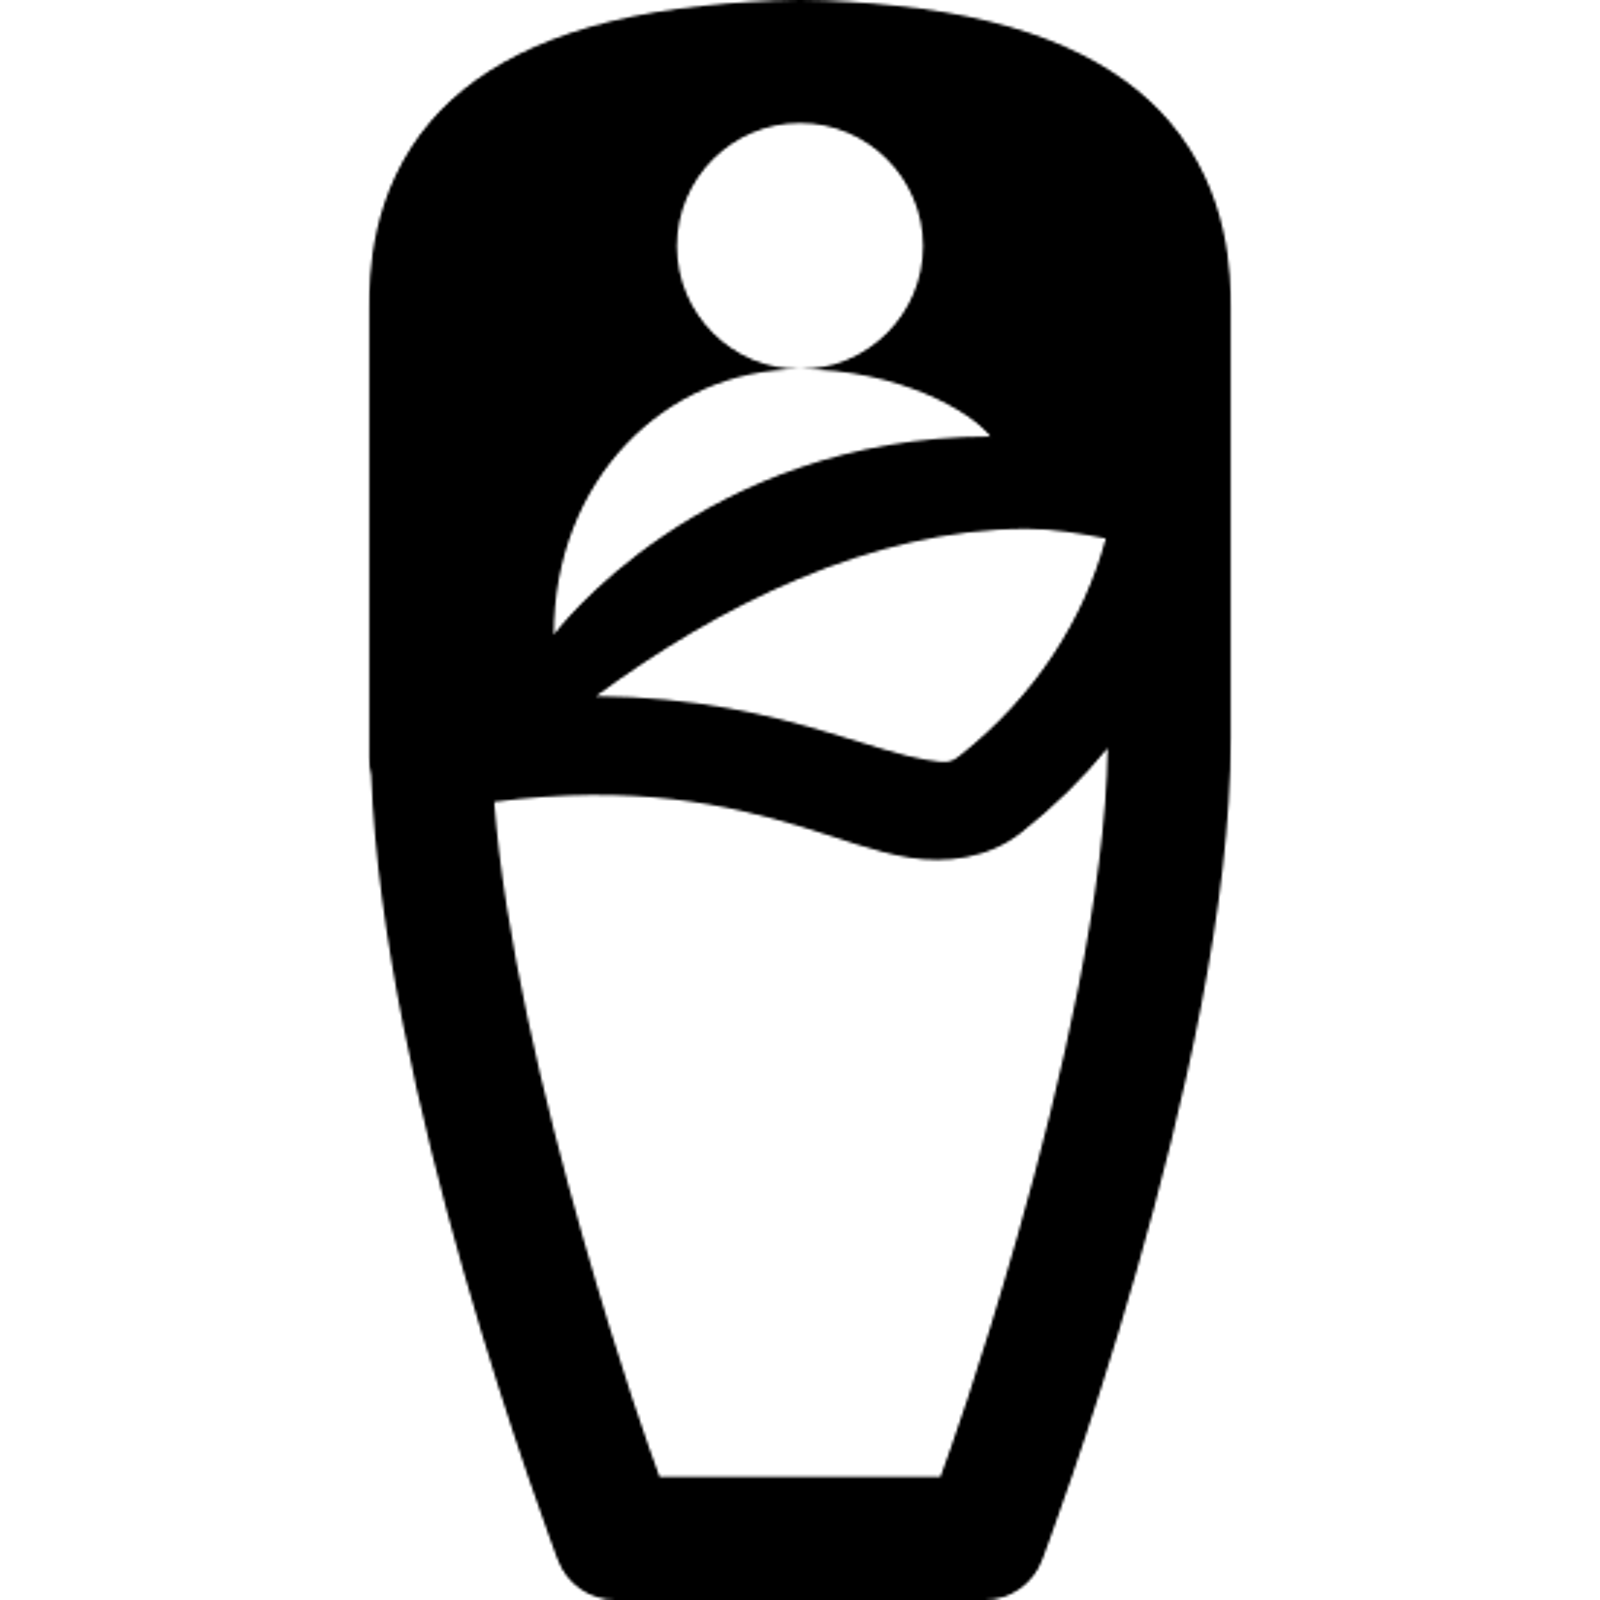 Sleeping Bag icon